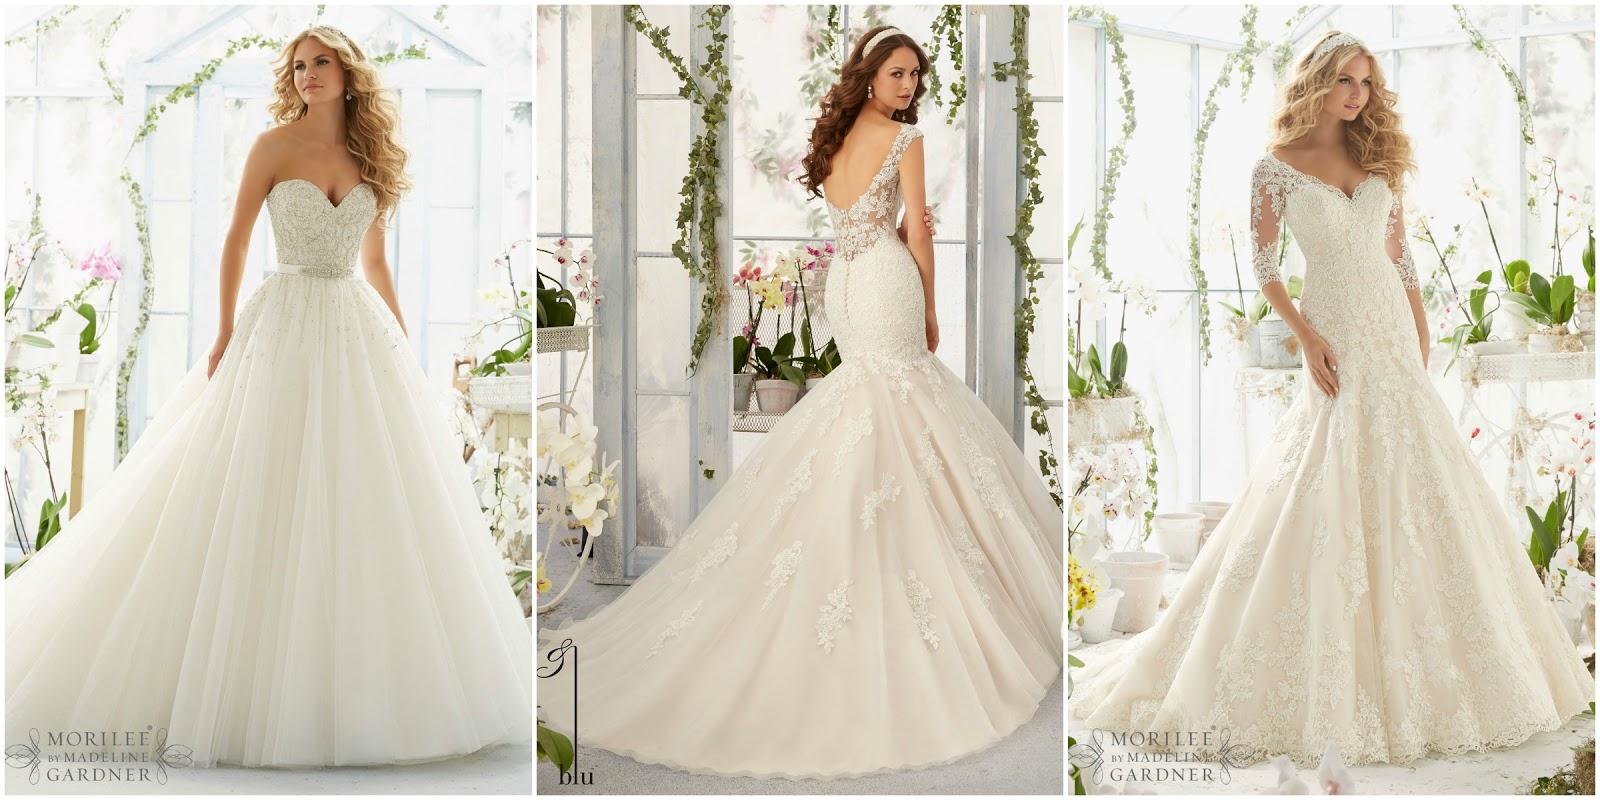 wedding dresses online stores photo - 1